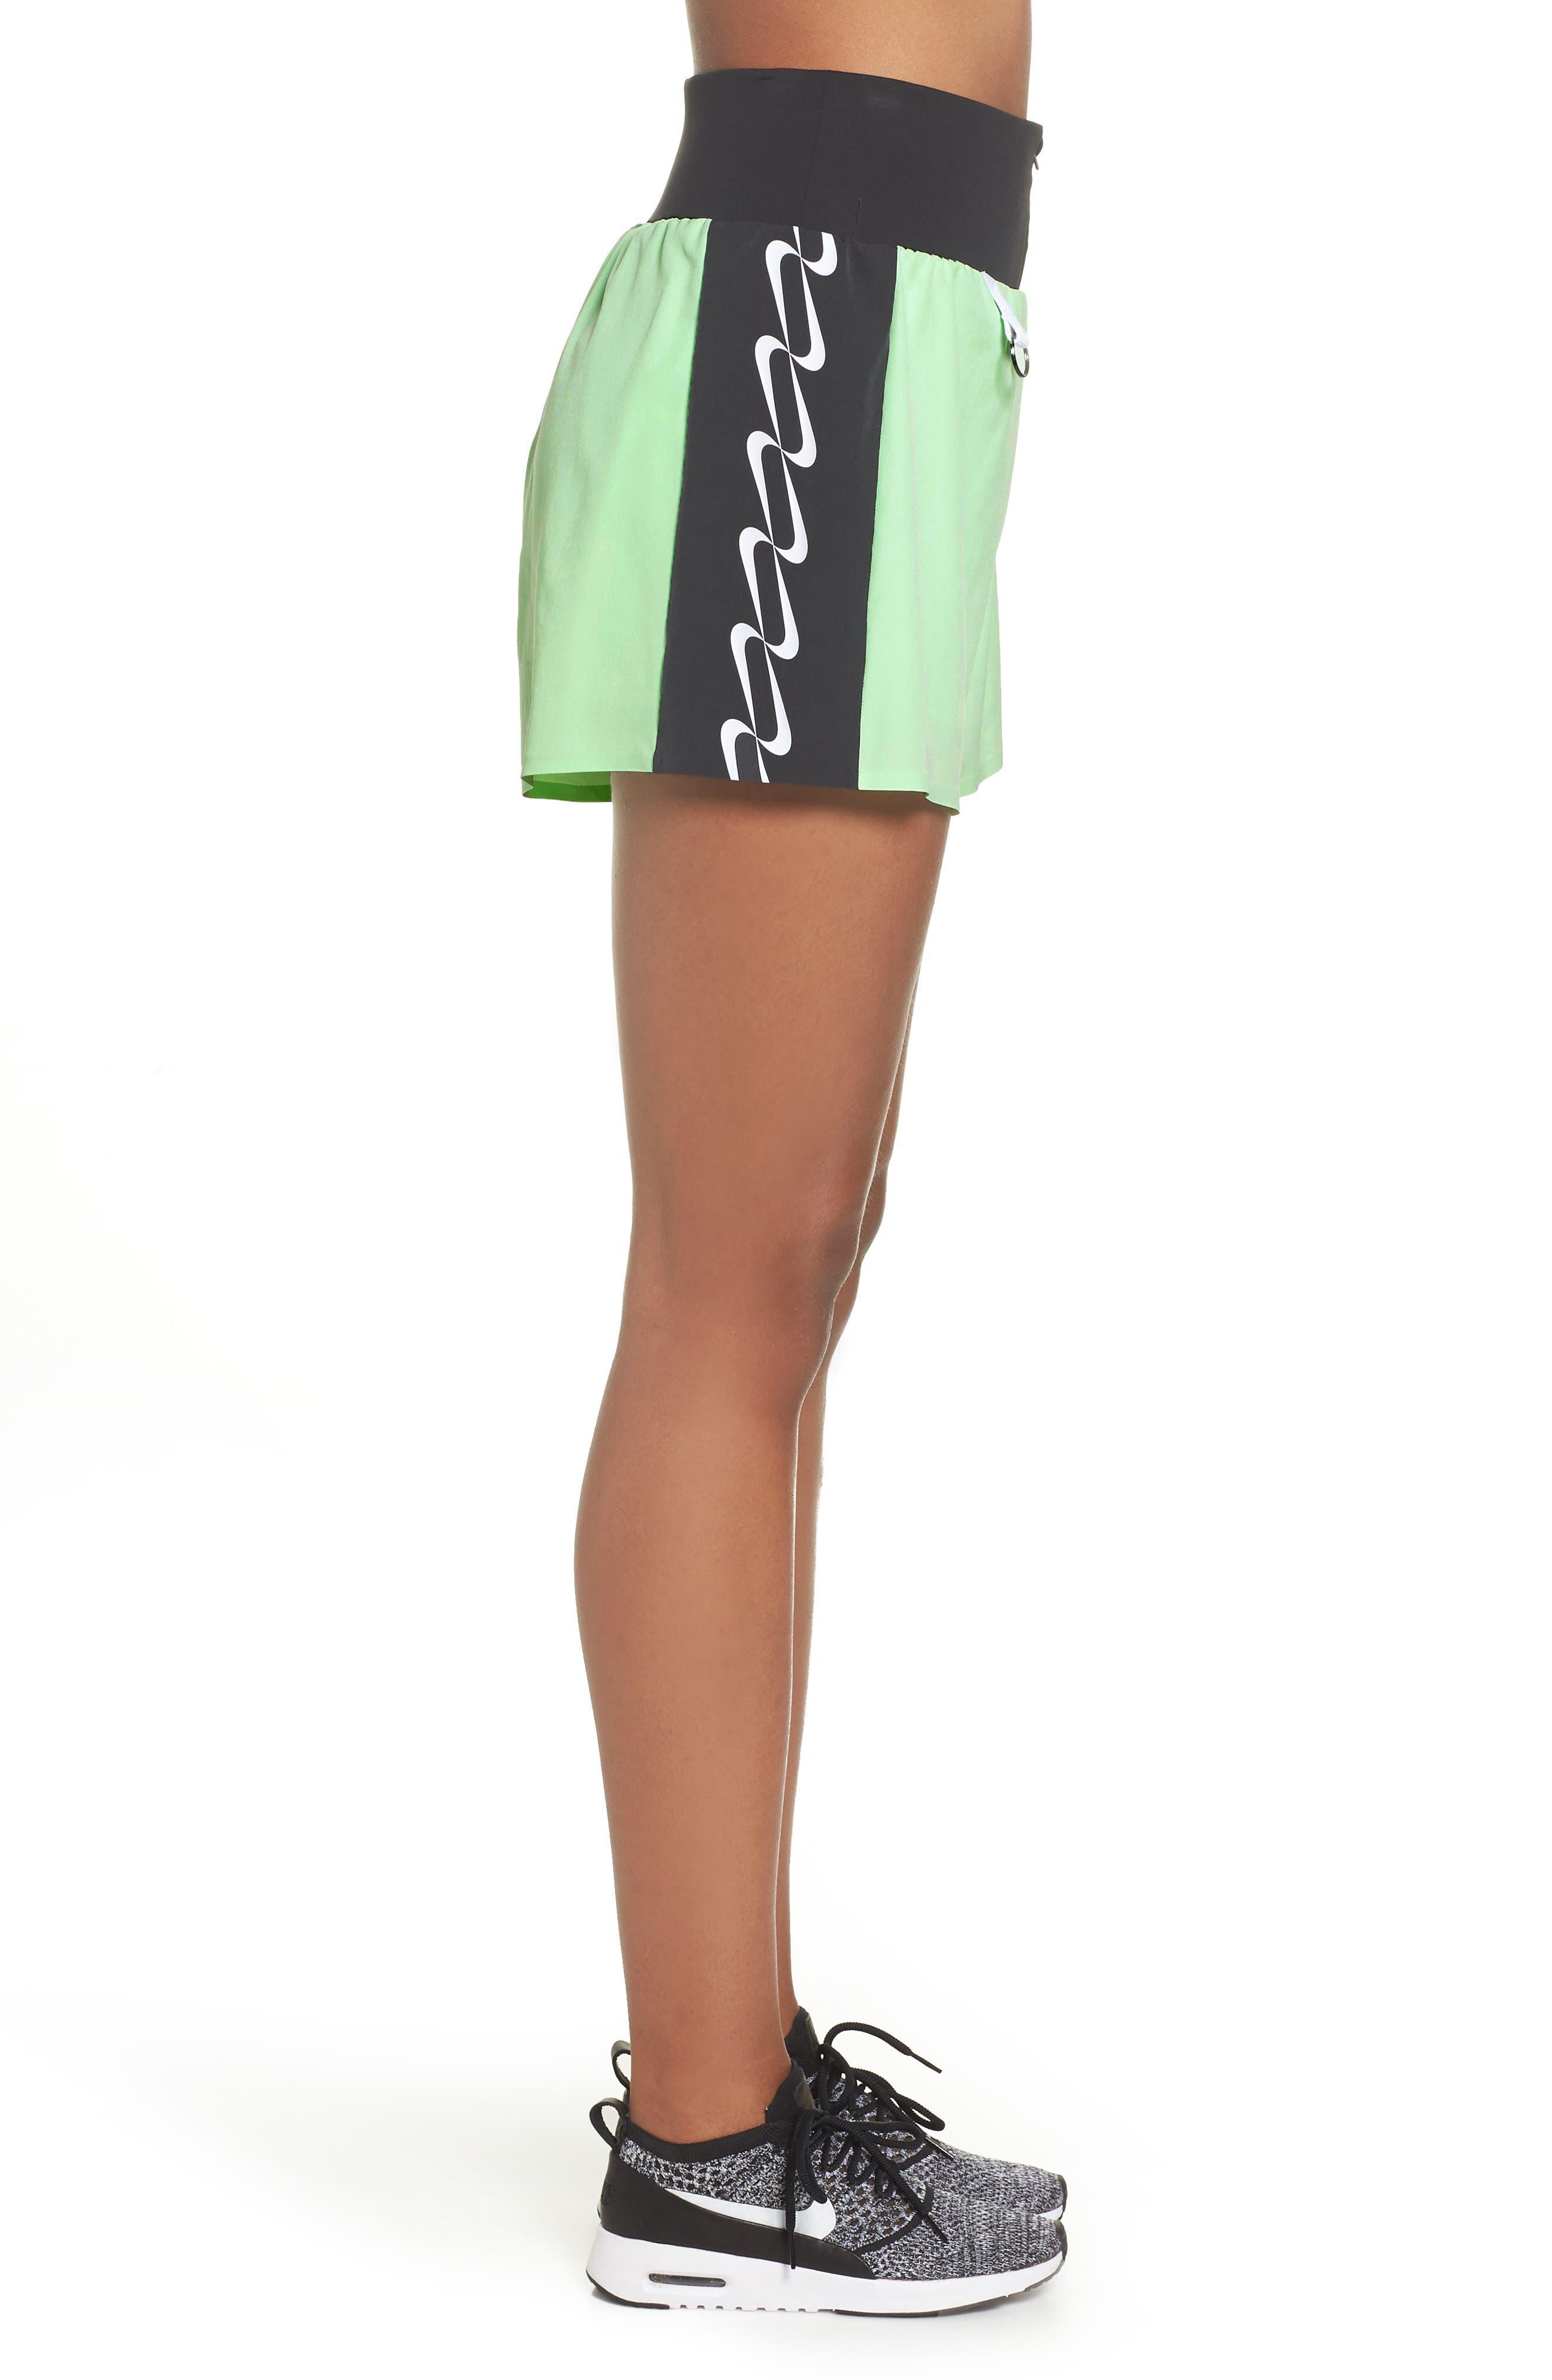 NRG Women's Dri-FIT Running Shorts,                             Alternate thumbnail 3, color,                             VAPOR GREEN/ BLACK/ WHITE